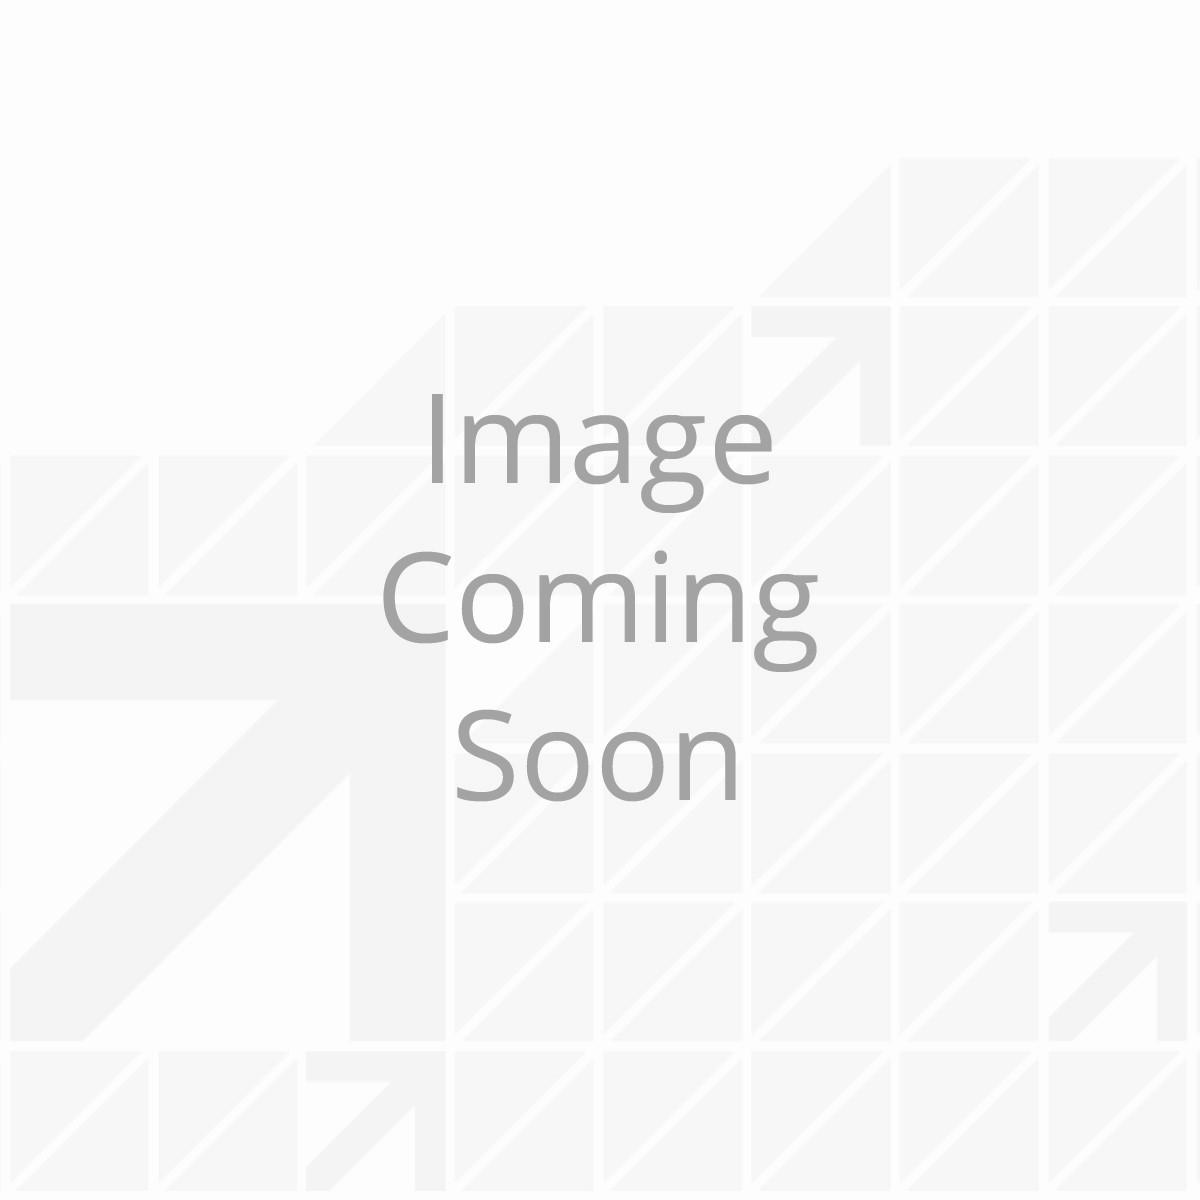 2 Room Manifold/Valve